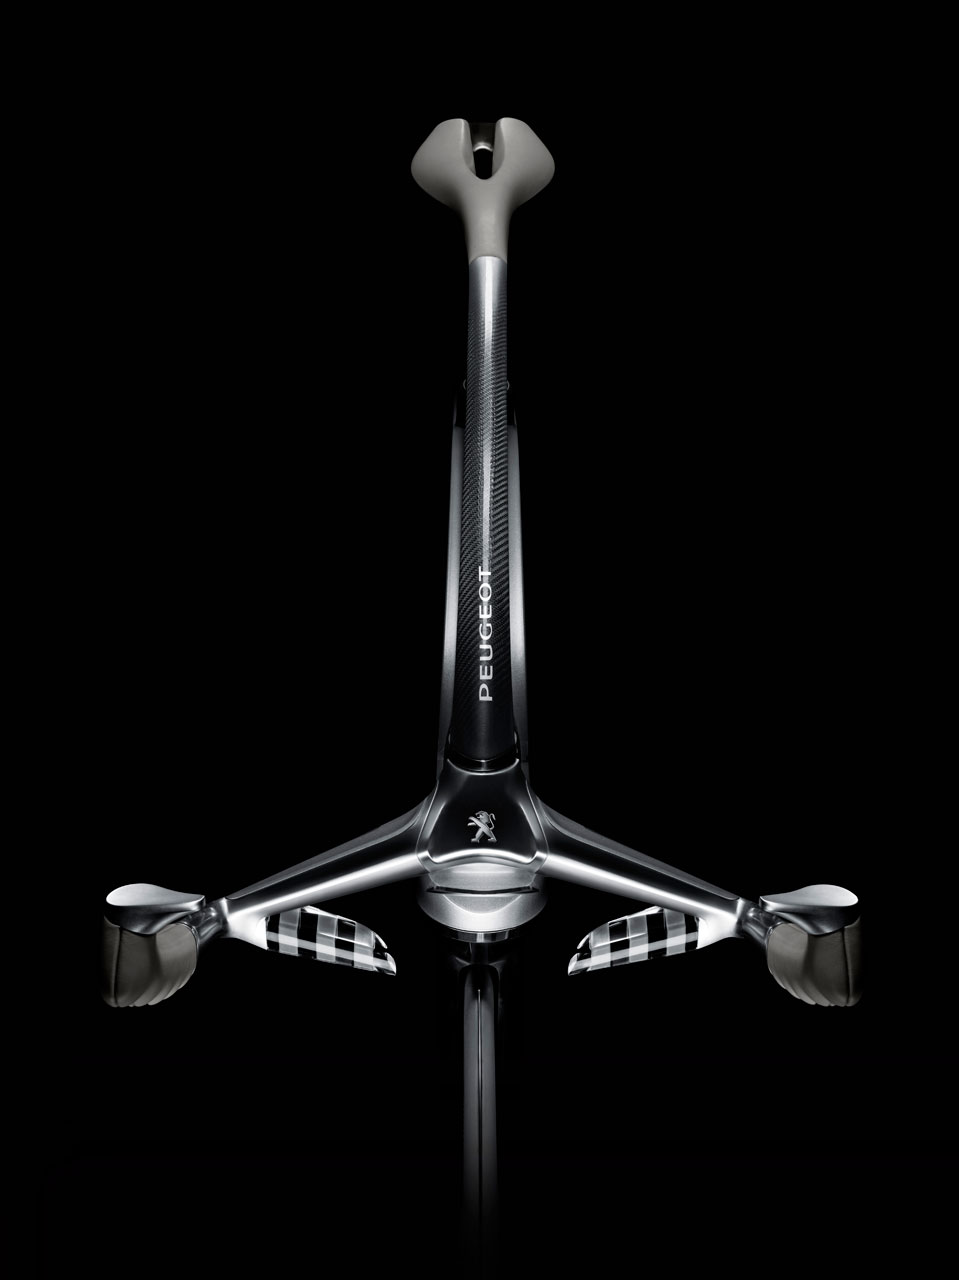 https://i0.wp.com/www.carbodydesign.com/archive/2010/02/peugeot-b1k-bike-concept/Peugeot-B1K-Bike-Concept-3-lg.jpg